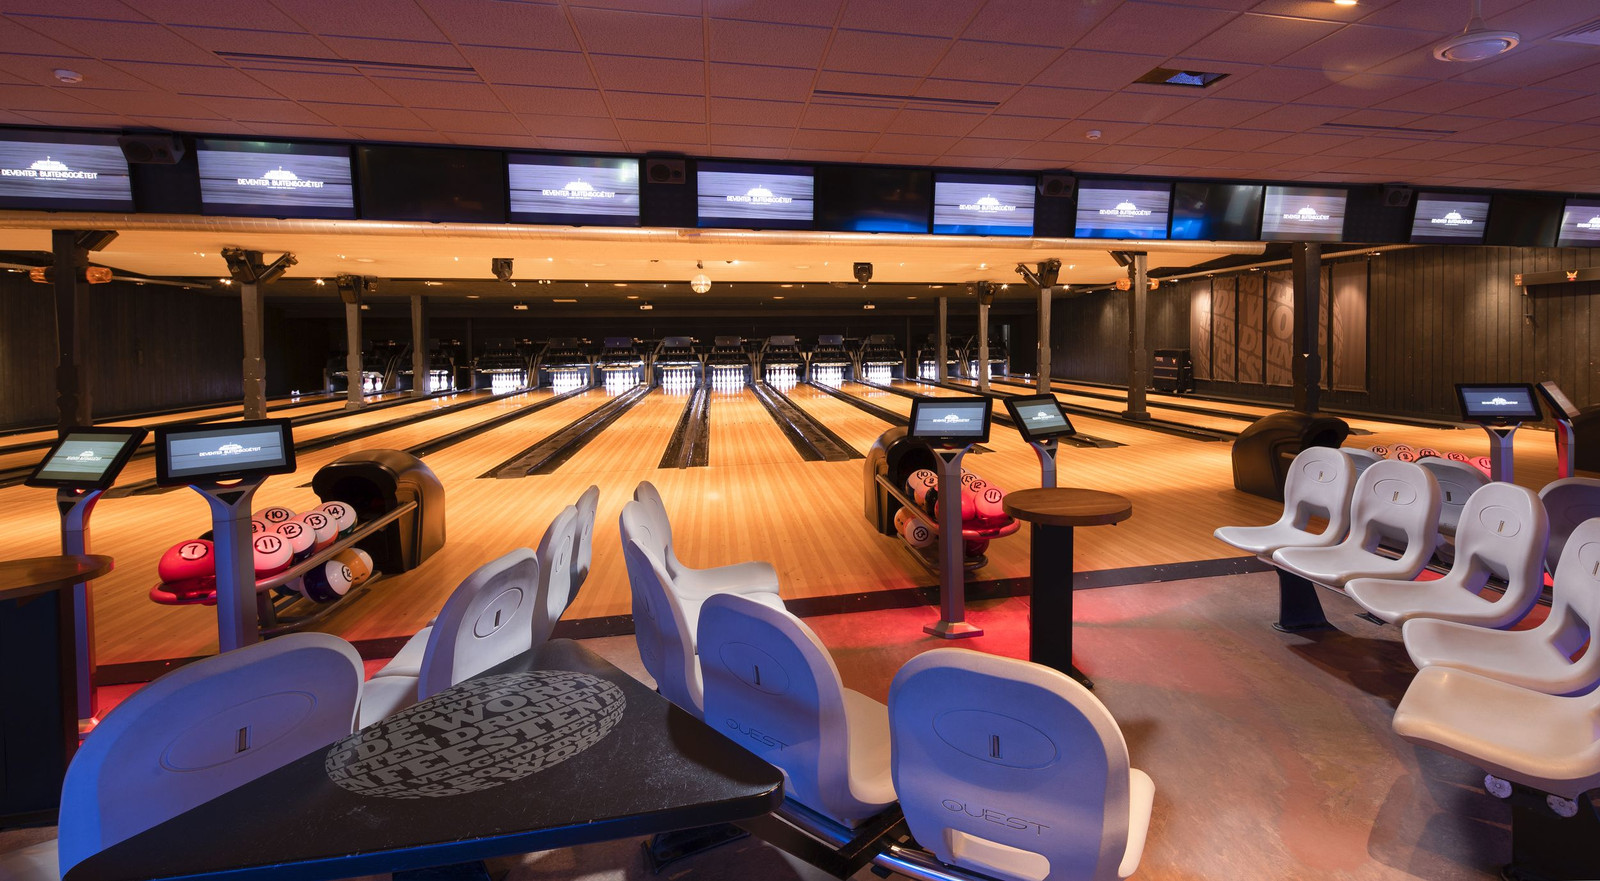 De bowlingbaan van de Deventer Buitensociëteit.